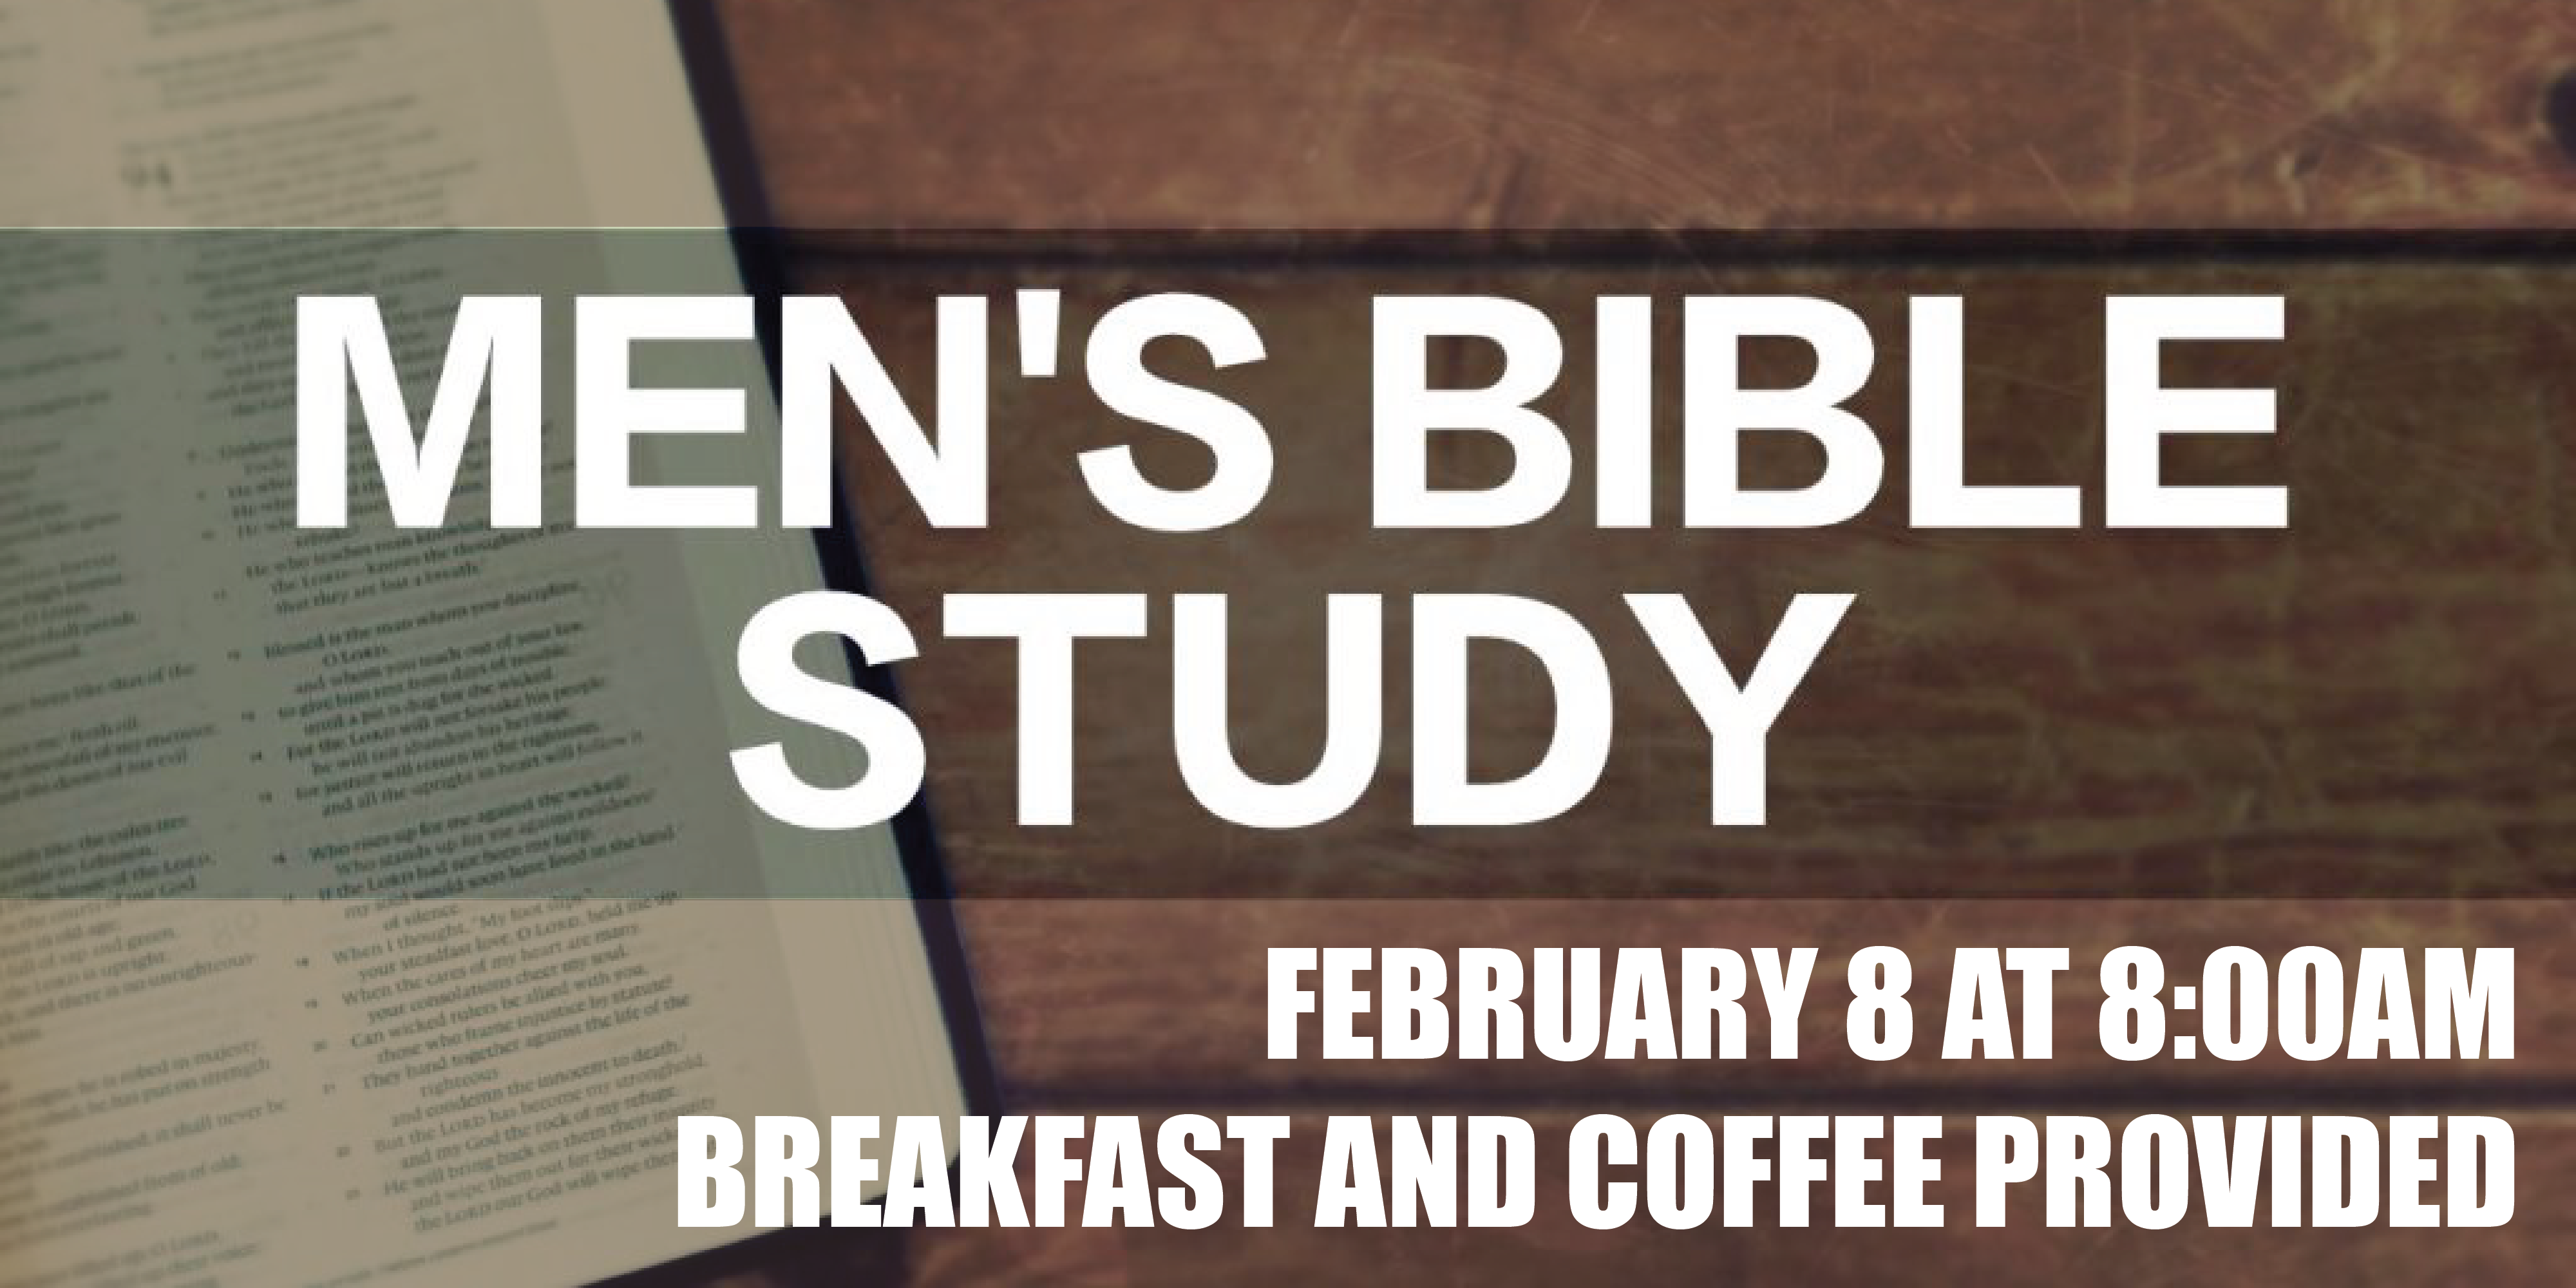 Highlands Presbyterian Church Grayson Georgia Mens Bible Study